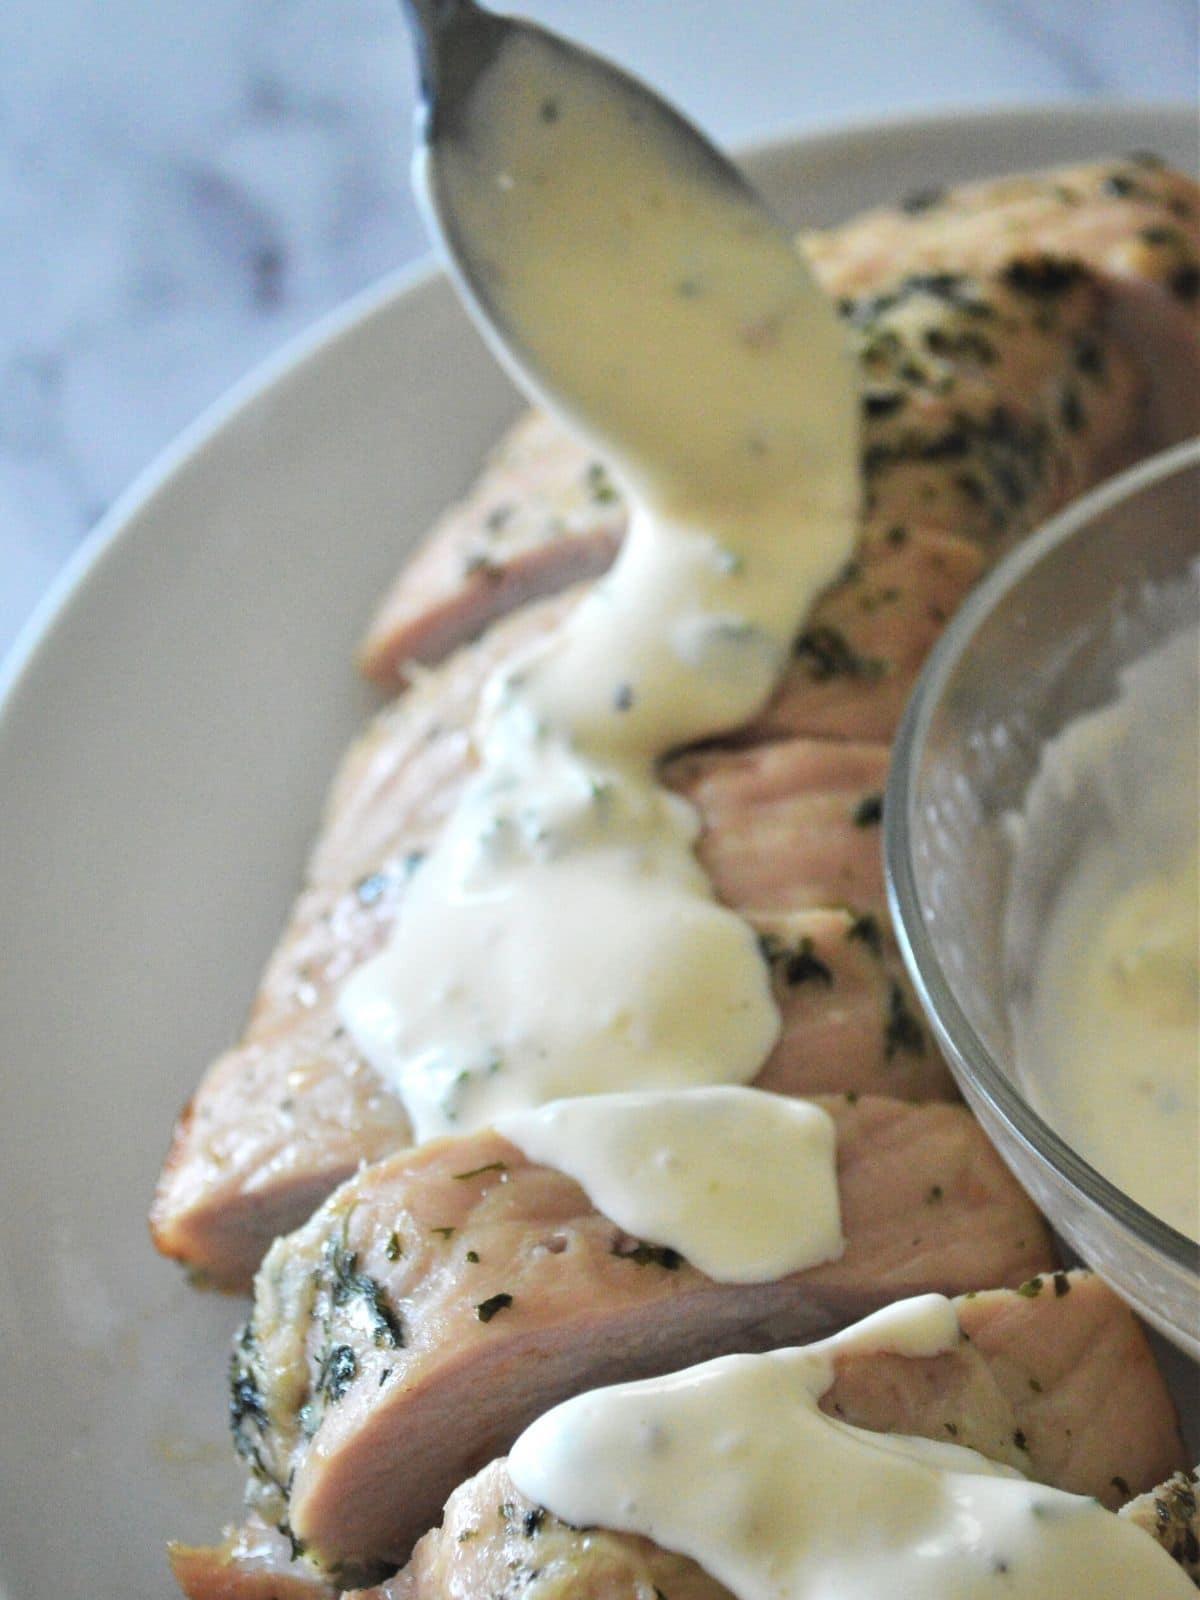 Roasted sliced pork topped with a smooth lemon aioli.